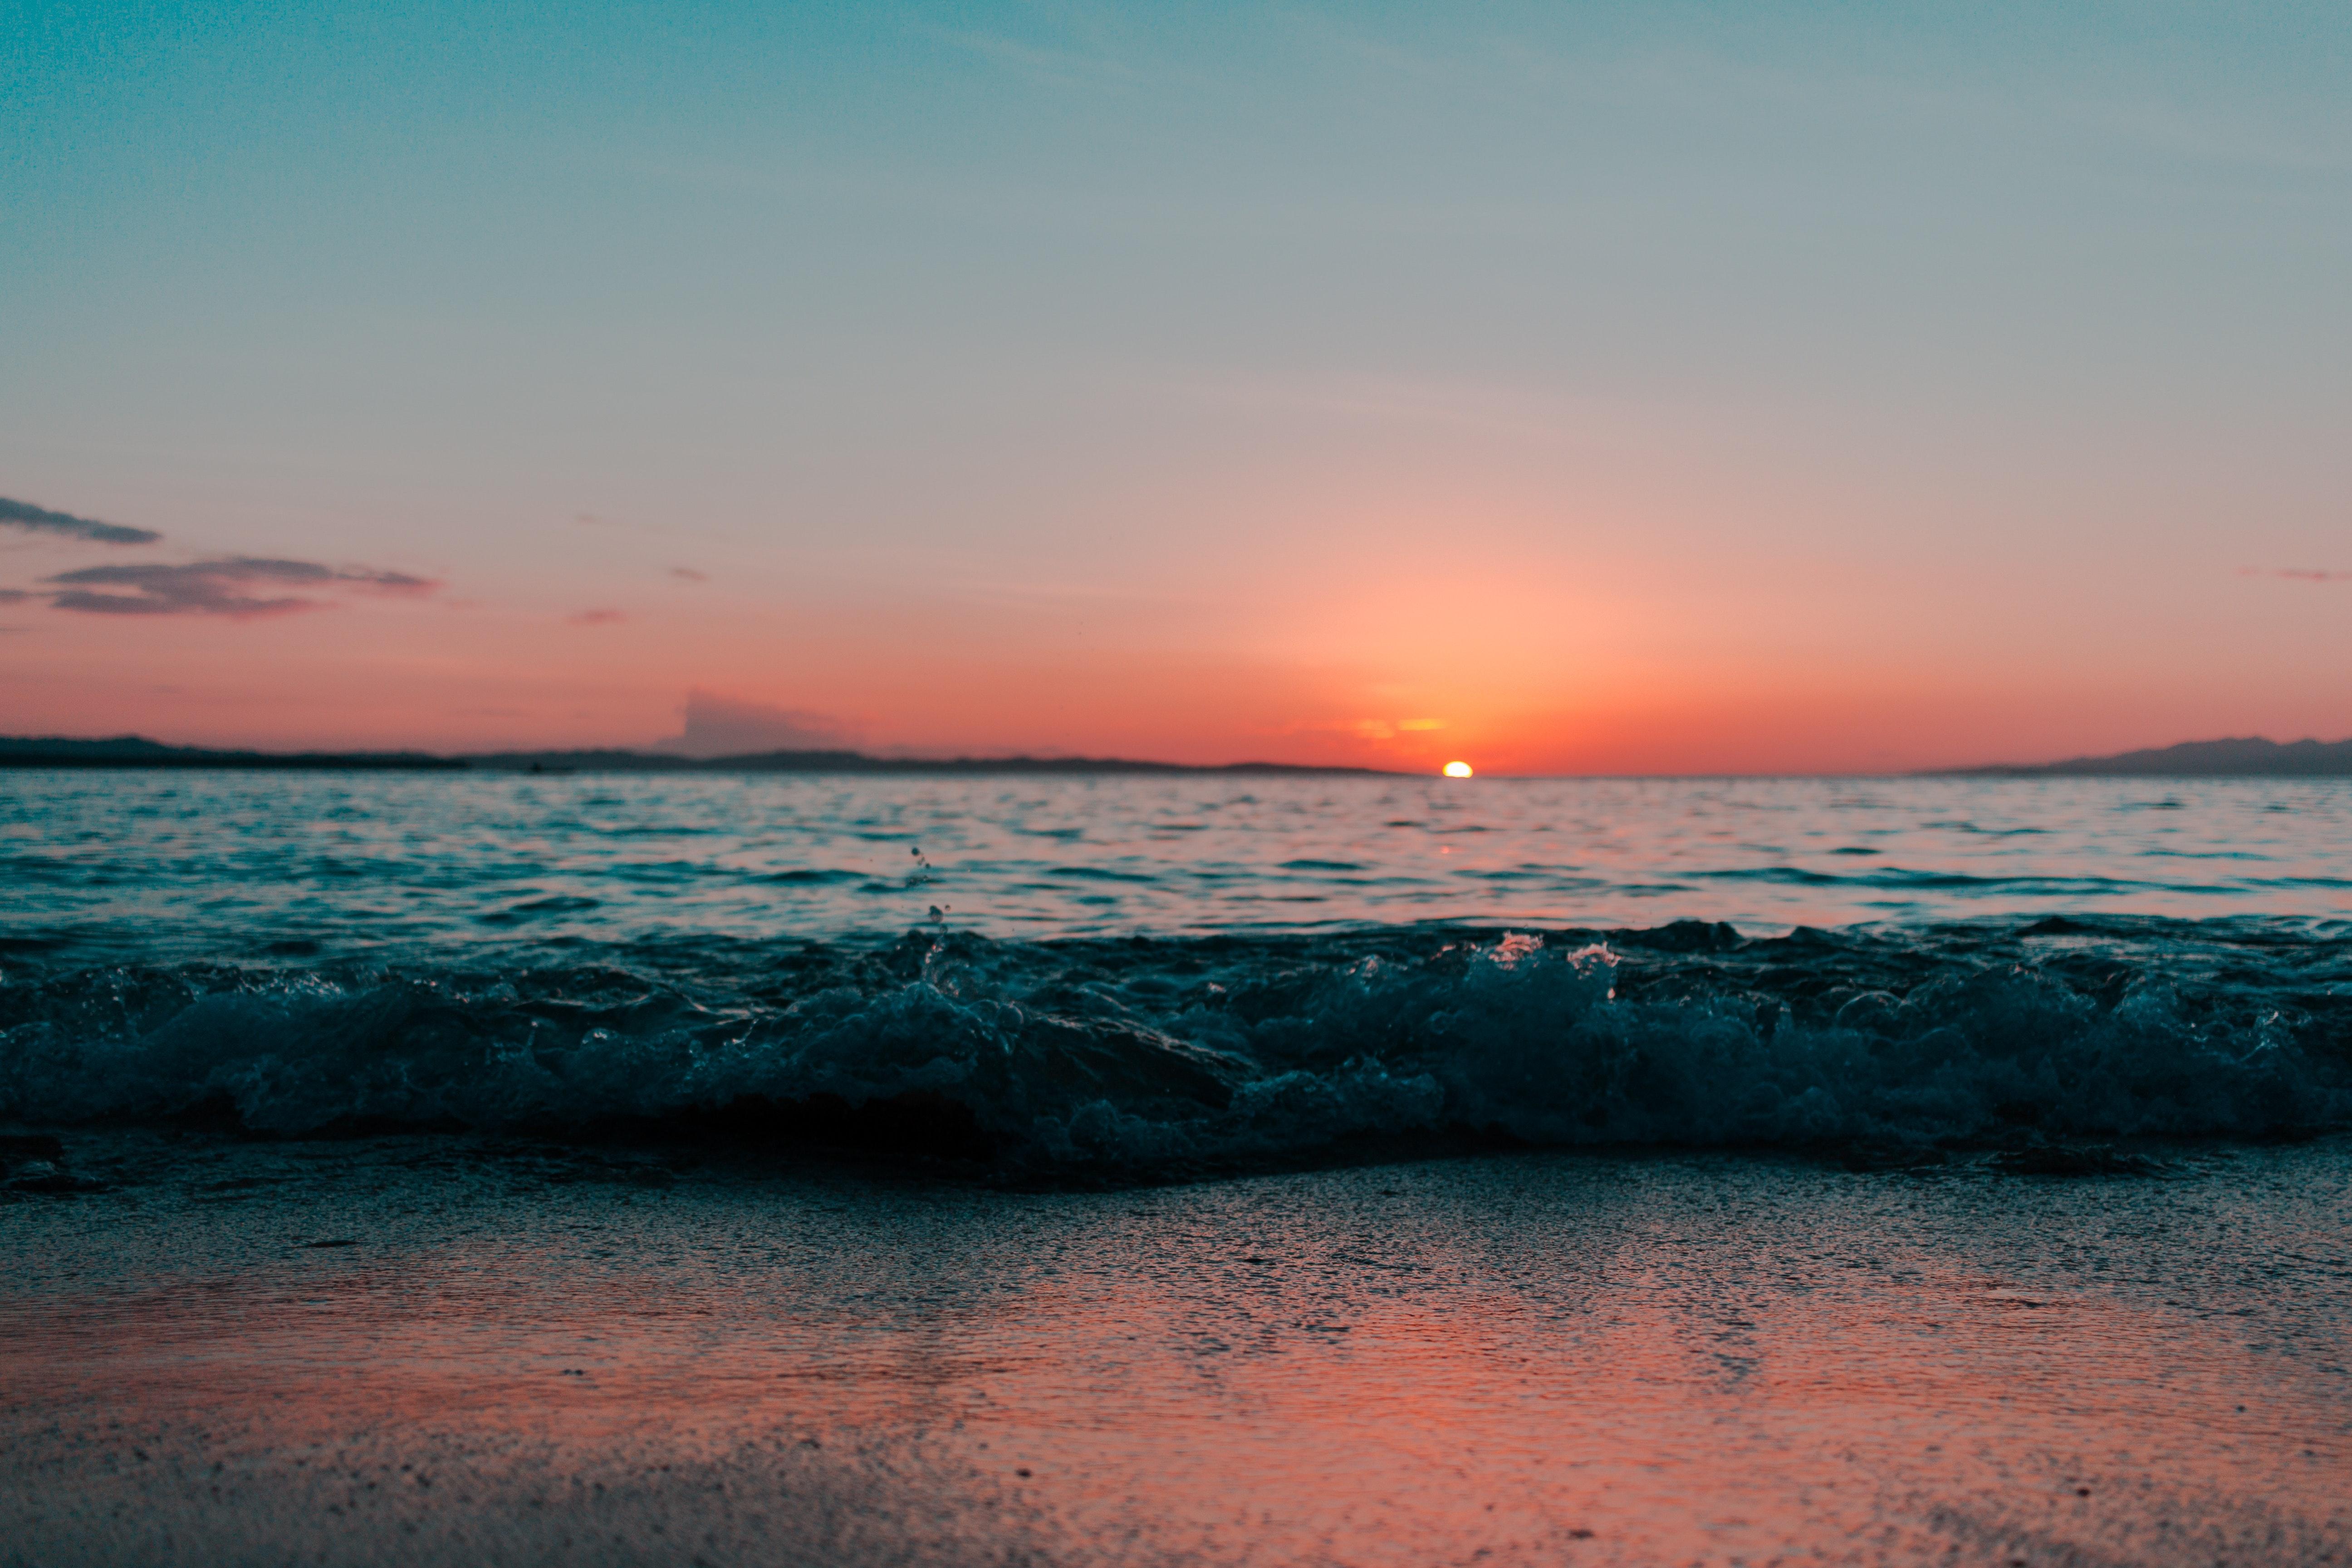 General 5184x3456 landscape waves sunset sea depth of field beach